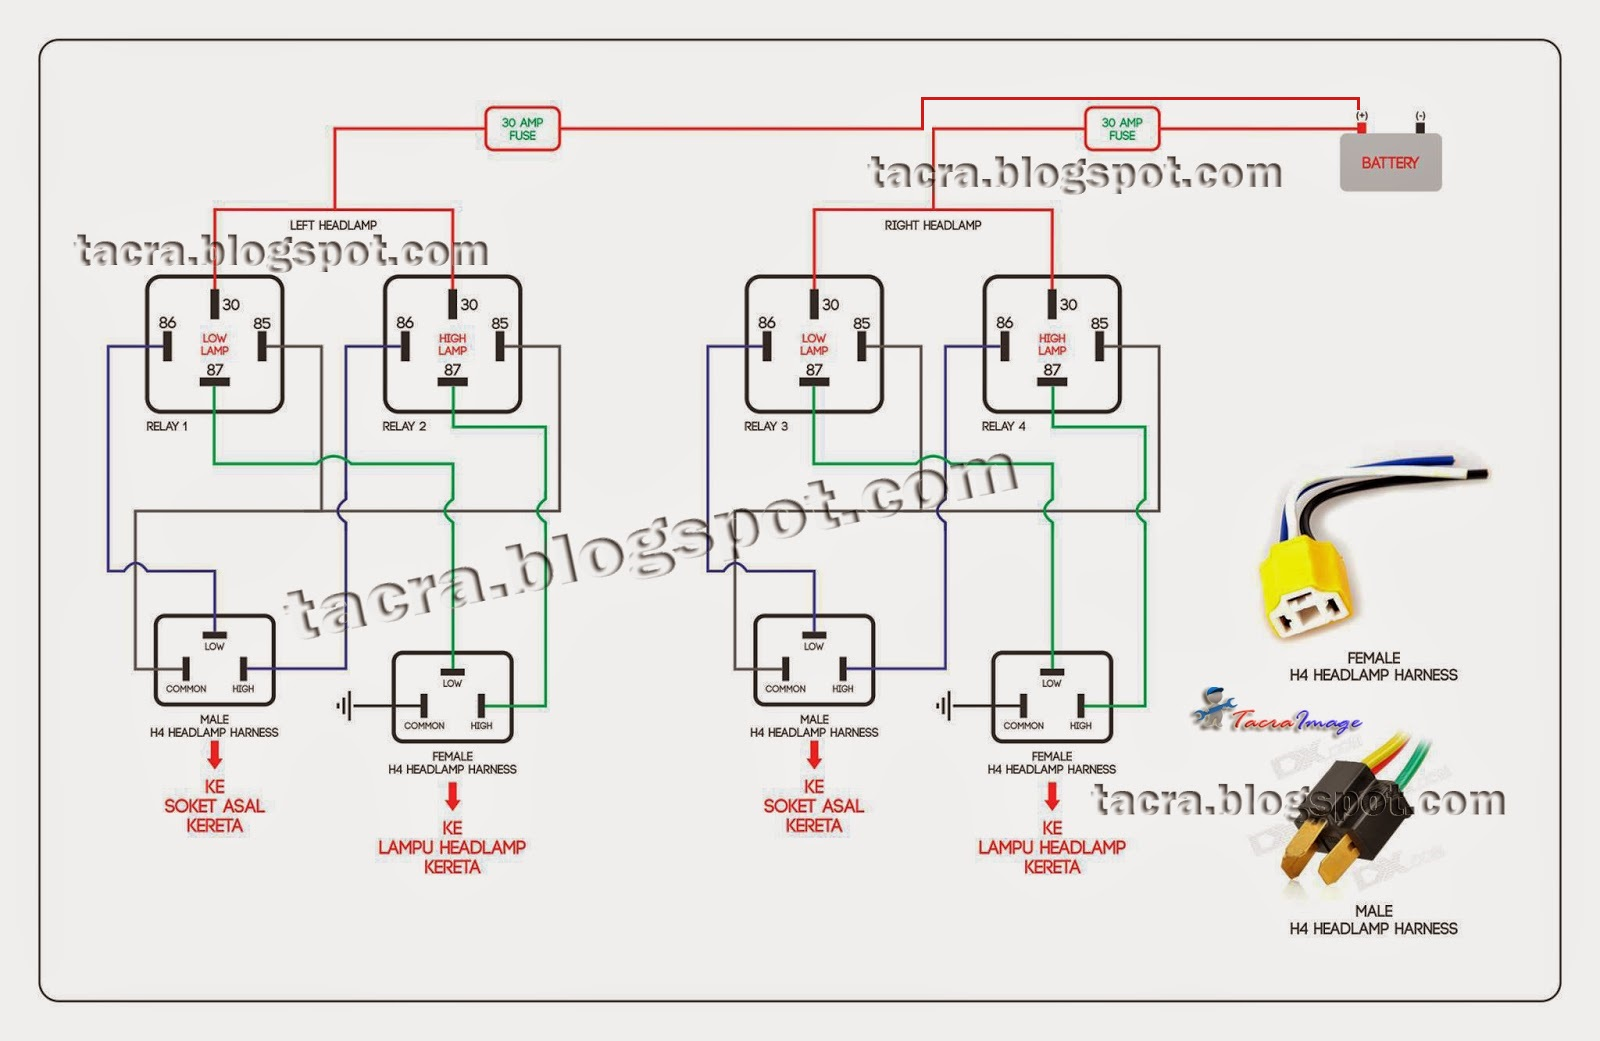 Proton Saga Blm Fuse Box Diagram F Under Dash Tacra S Diy Garage Headlamp Relay Kit Spdt